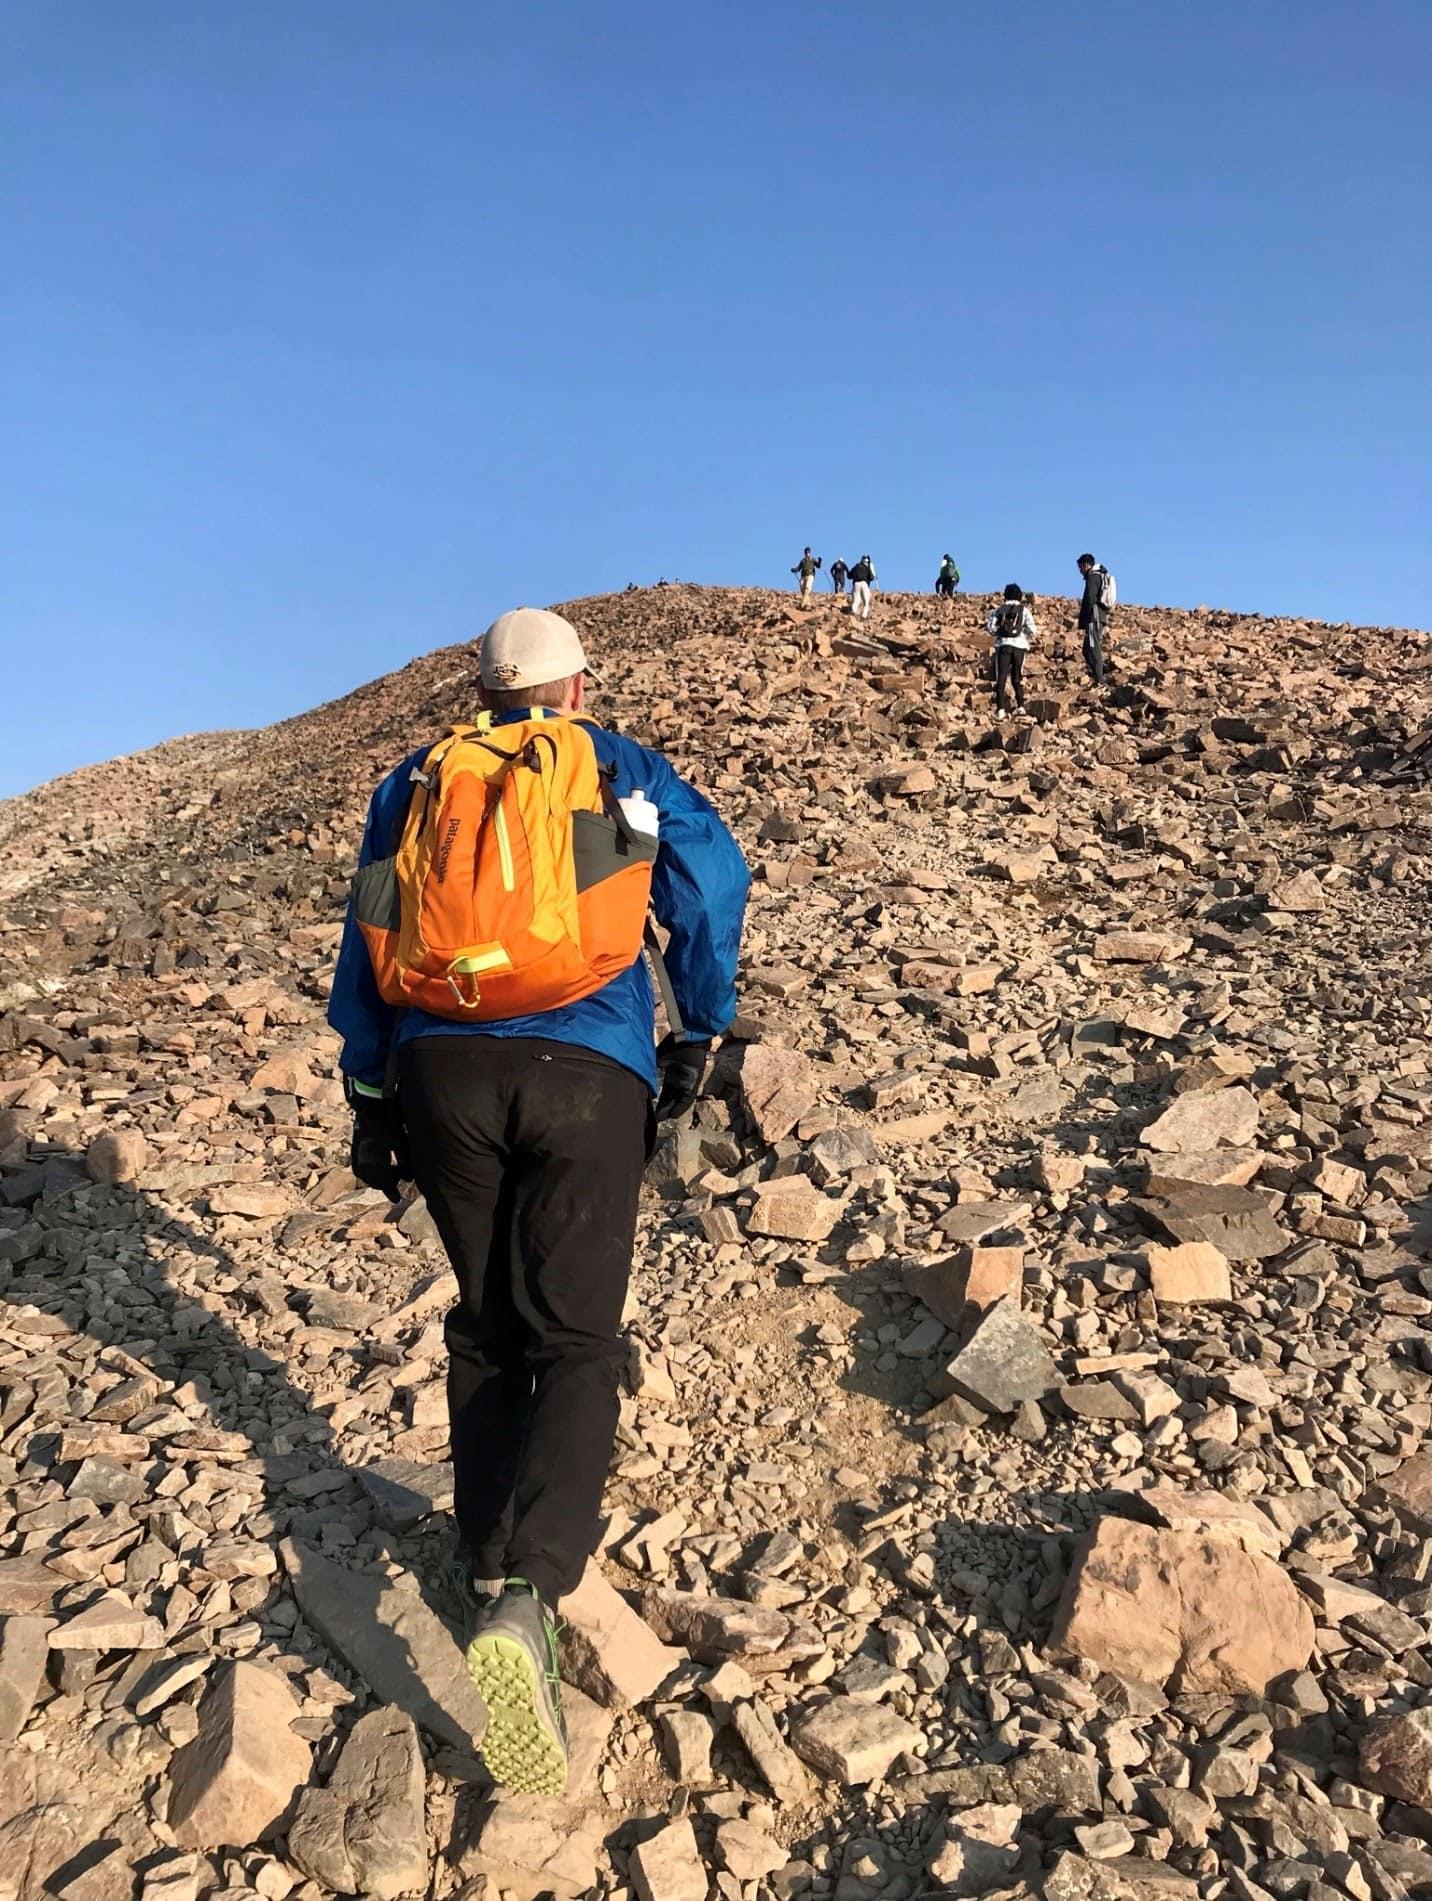 hikers climbing up a mountain